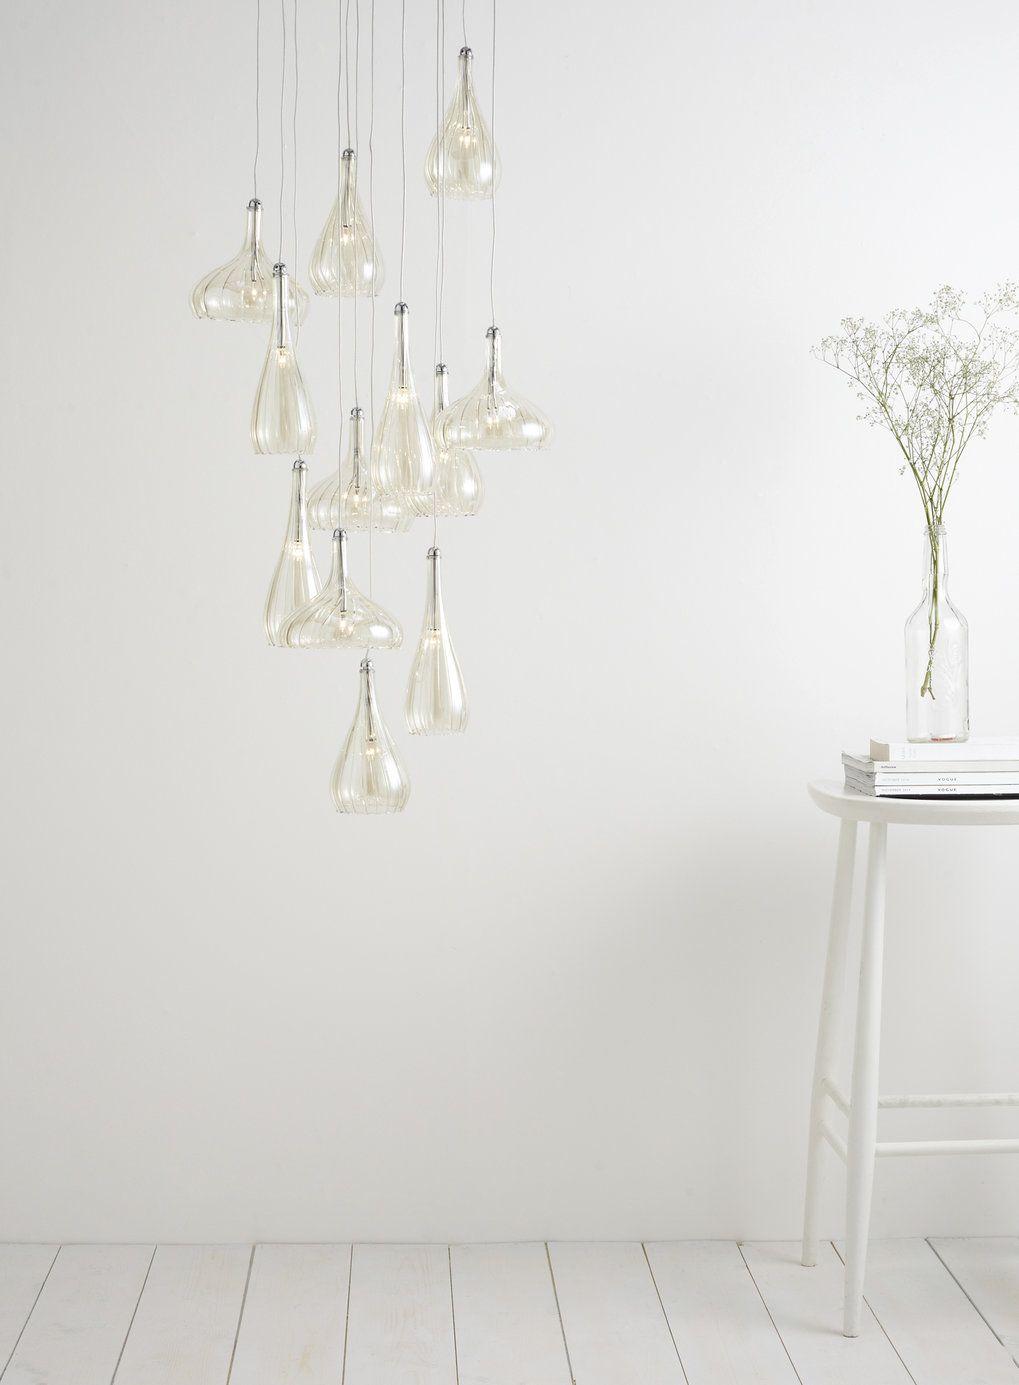 Carrara 12 Light Ceiling Pendant Light - BHS 48\